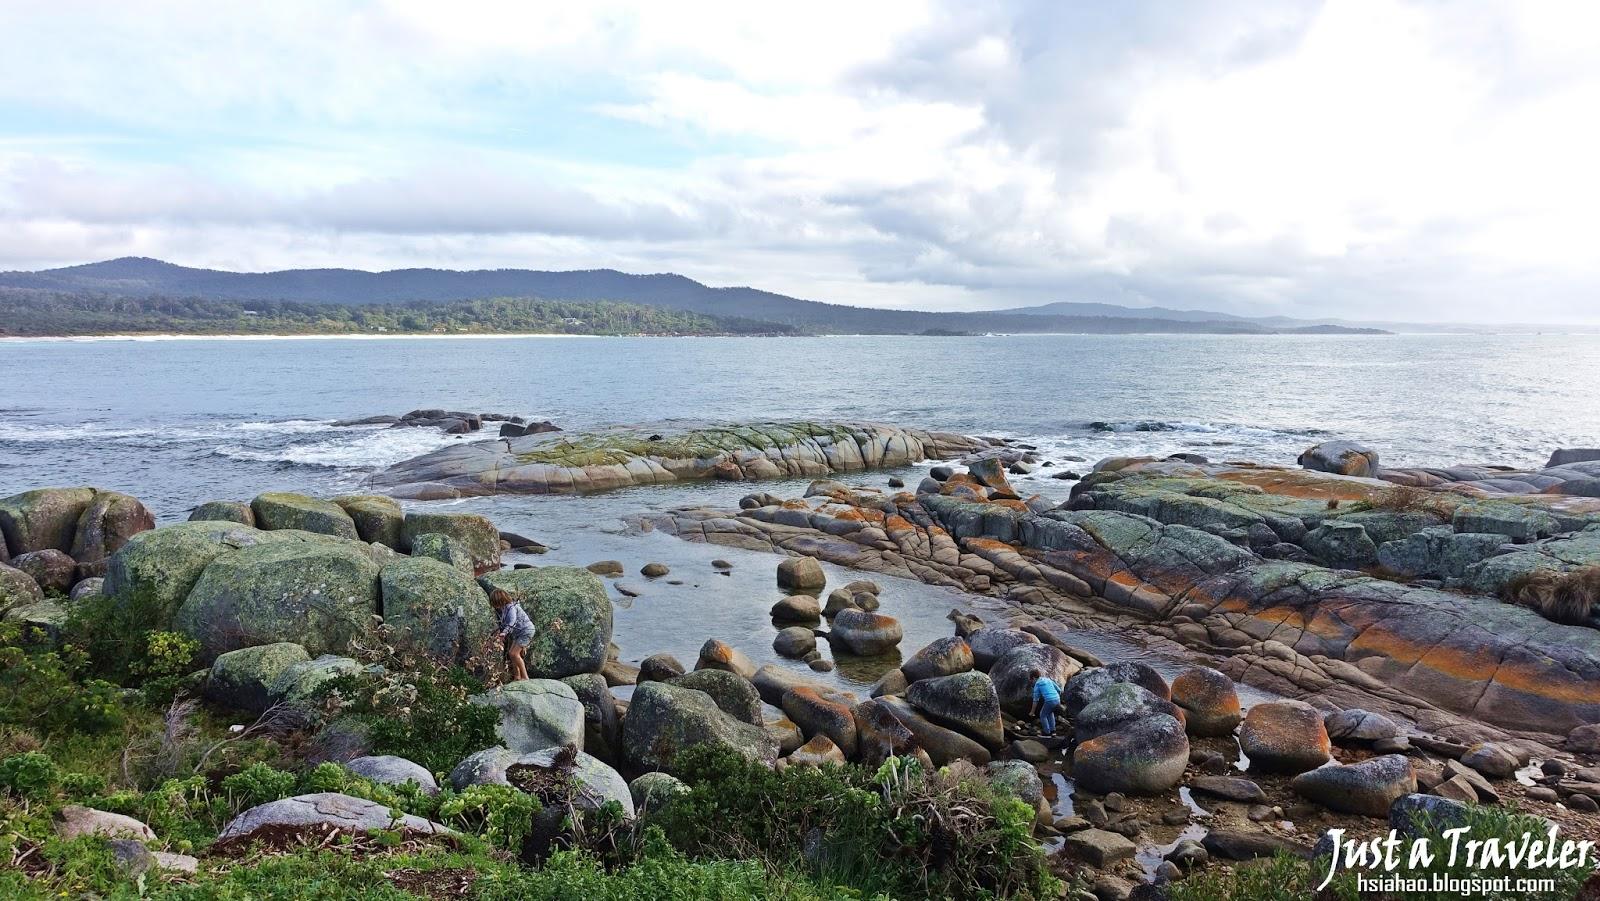 塔斯馬尼亞-景點-推薦-火焰灣-旅遊-自由行-澳洲-Tasmania-Bay-of-Fires-Tourist-Attraction-Australia